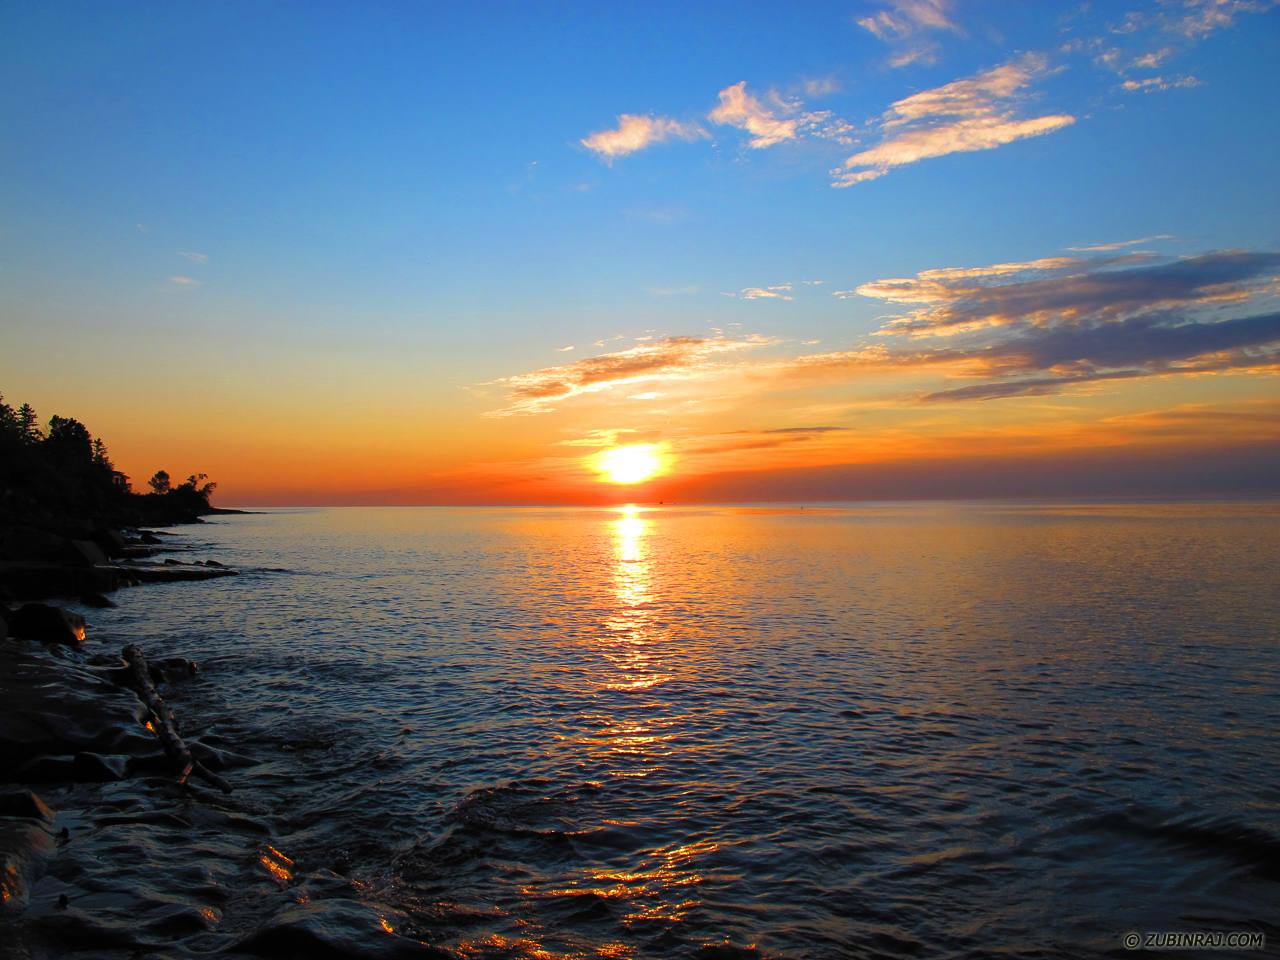 Sunset-At-Beach-Duluth-4408